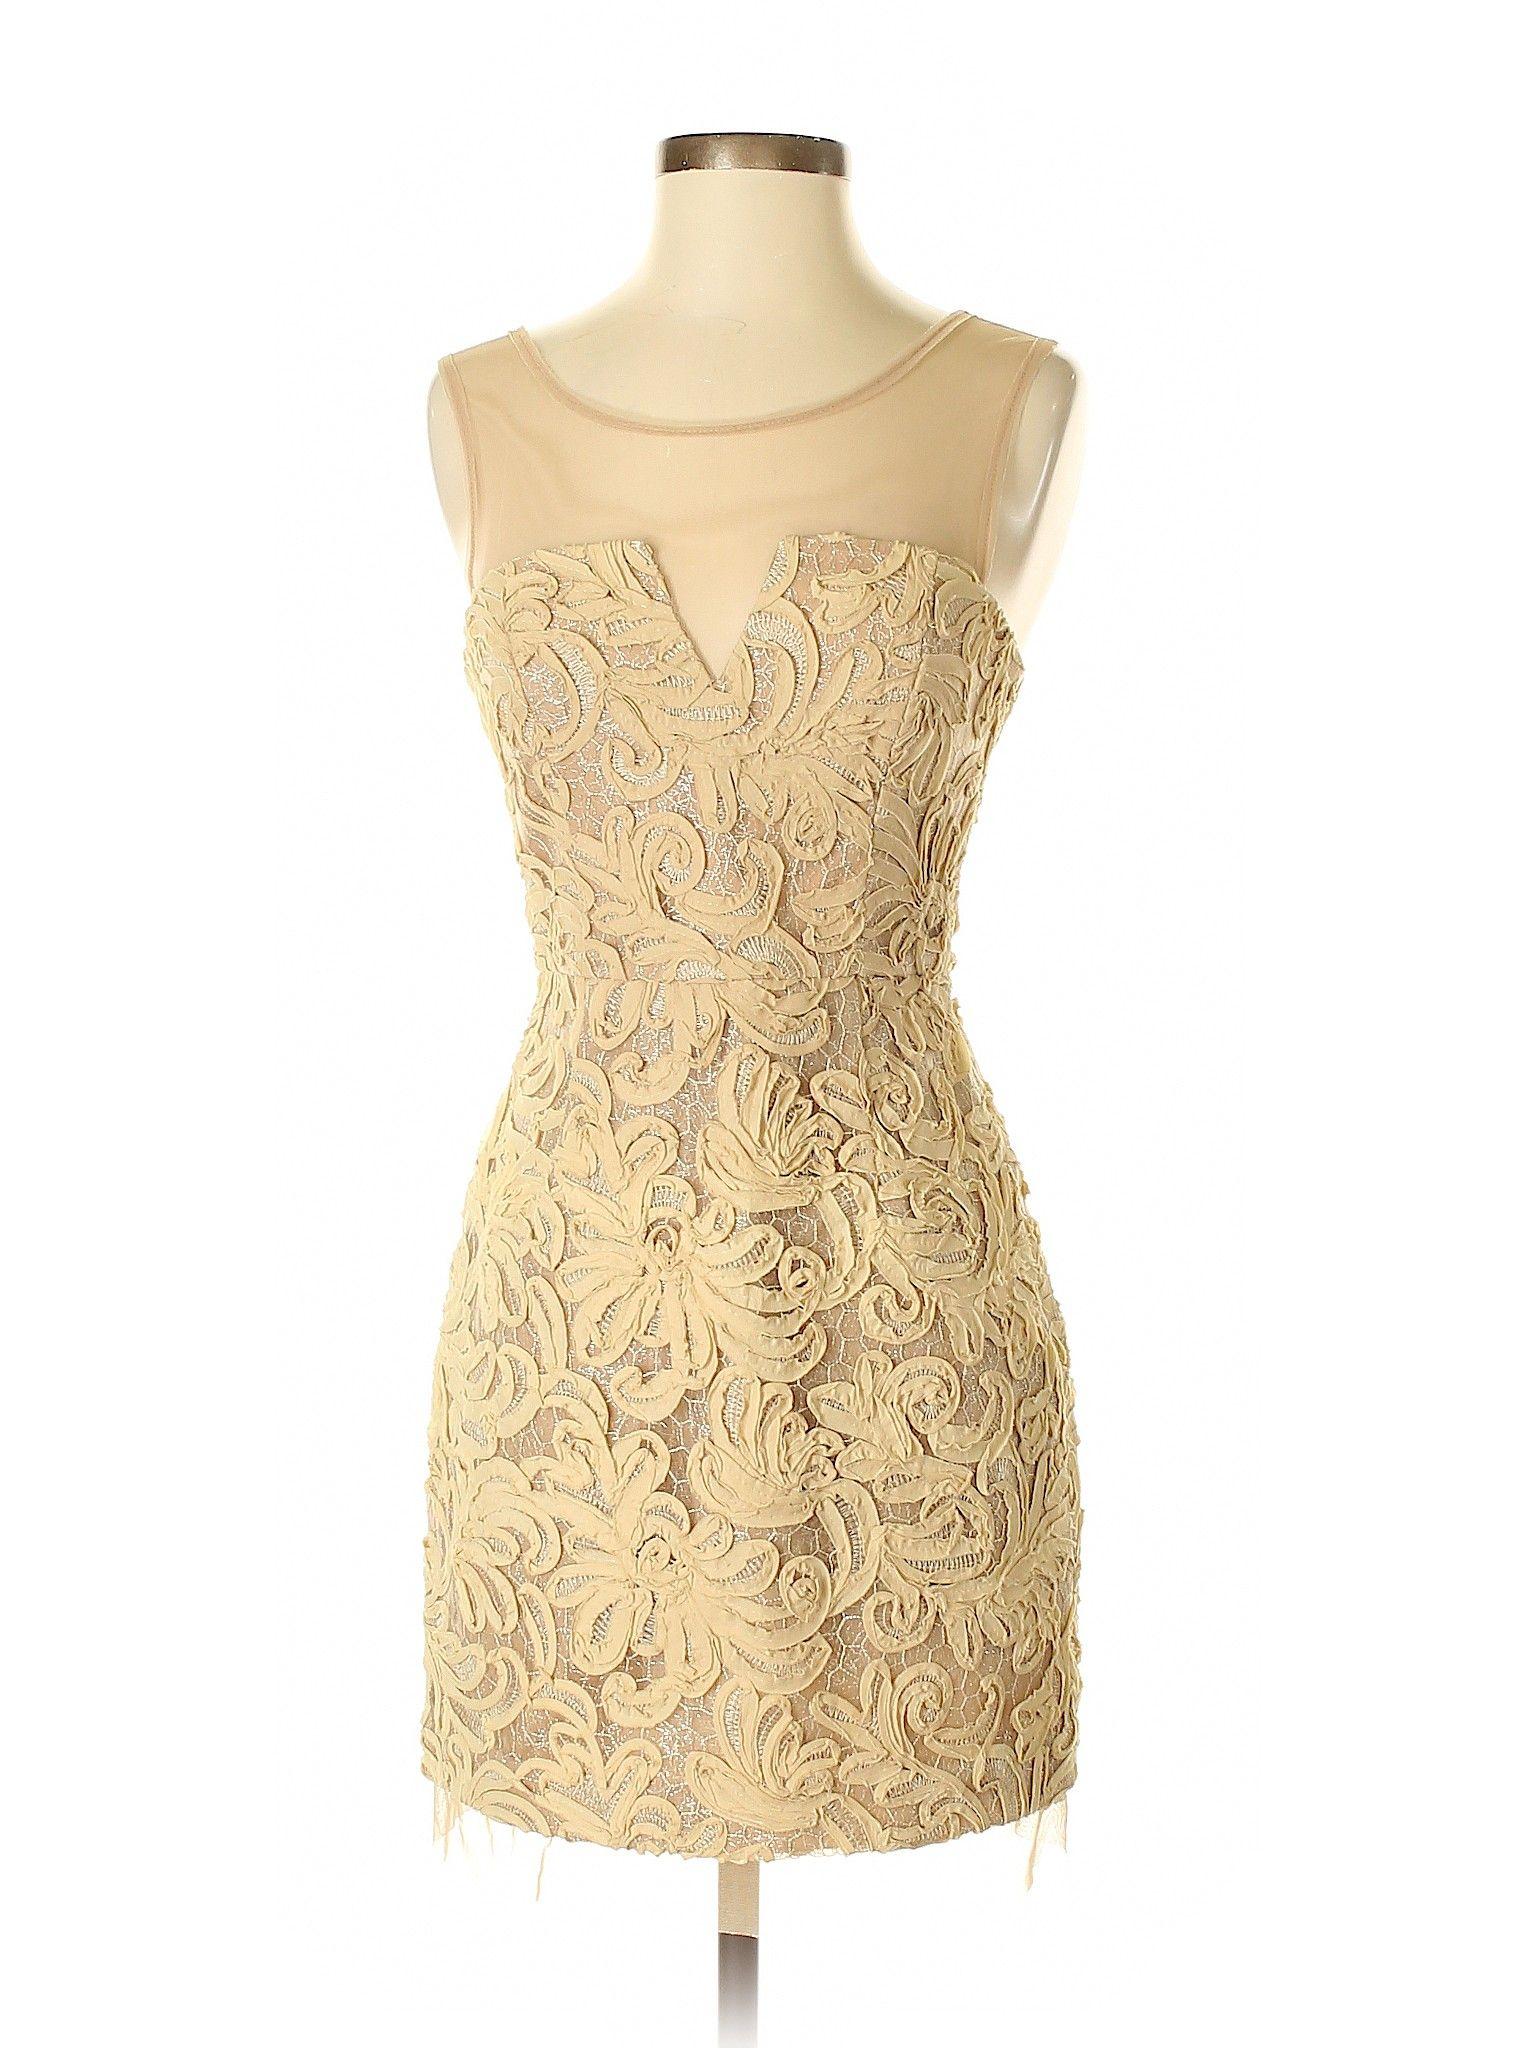 Bcbgmaxazria Cocktail Dress Sheath Tan Lace Dresses Used Size 4 In 2020 Dresses Tan Lace Dress Bcbgmaxazria Dresses [ 2048 x 1536 Pixel ]